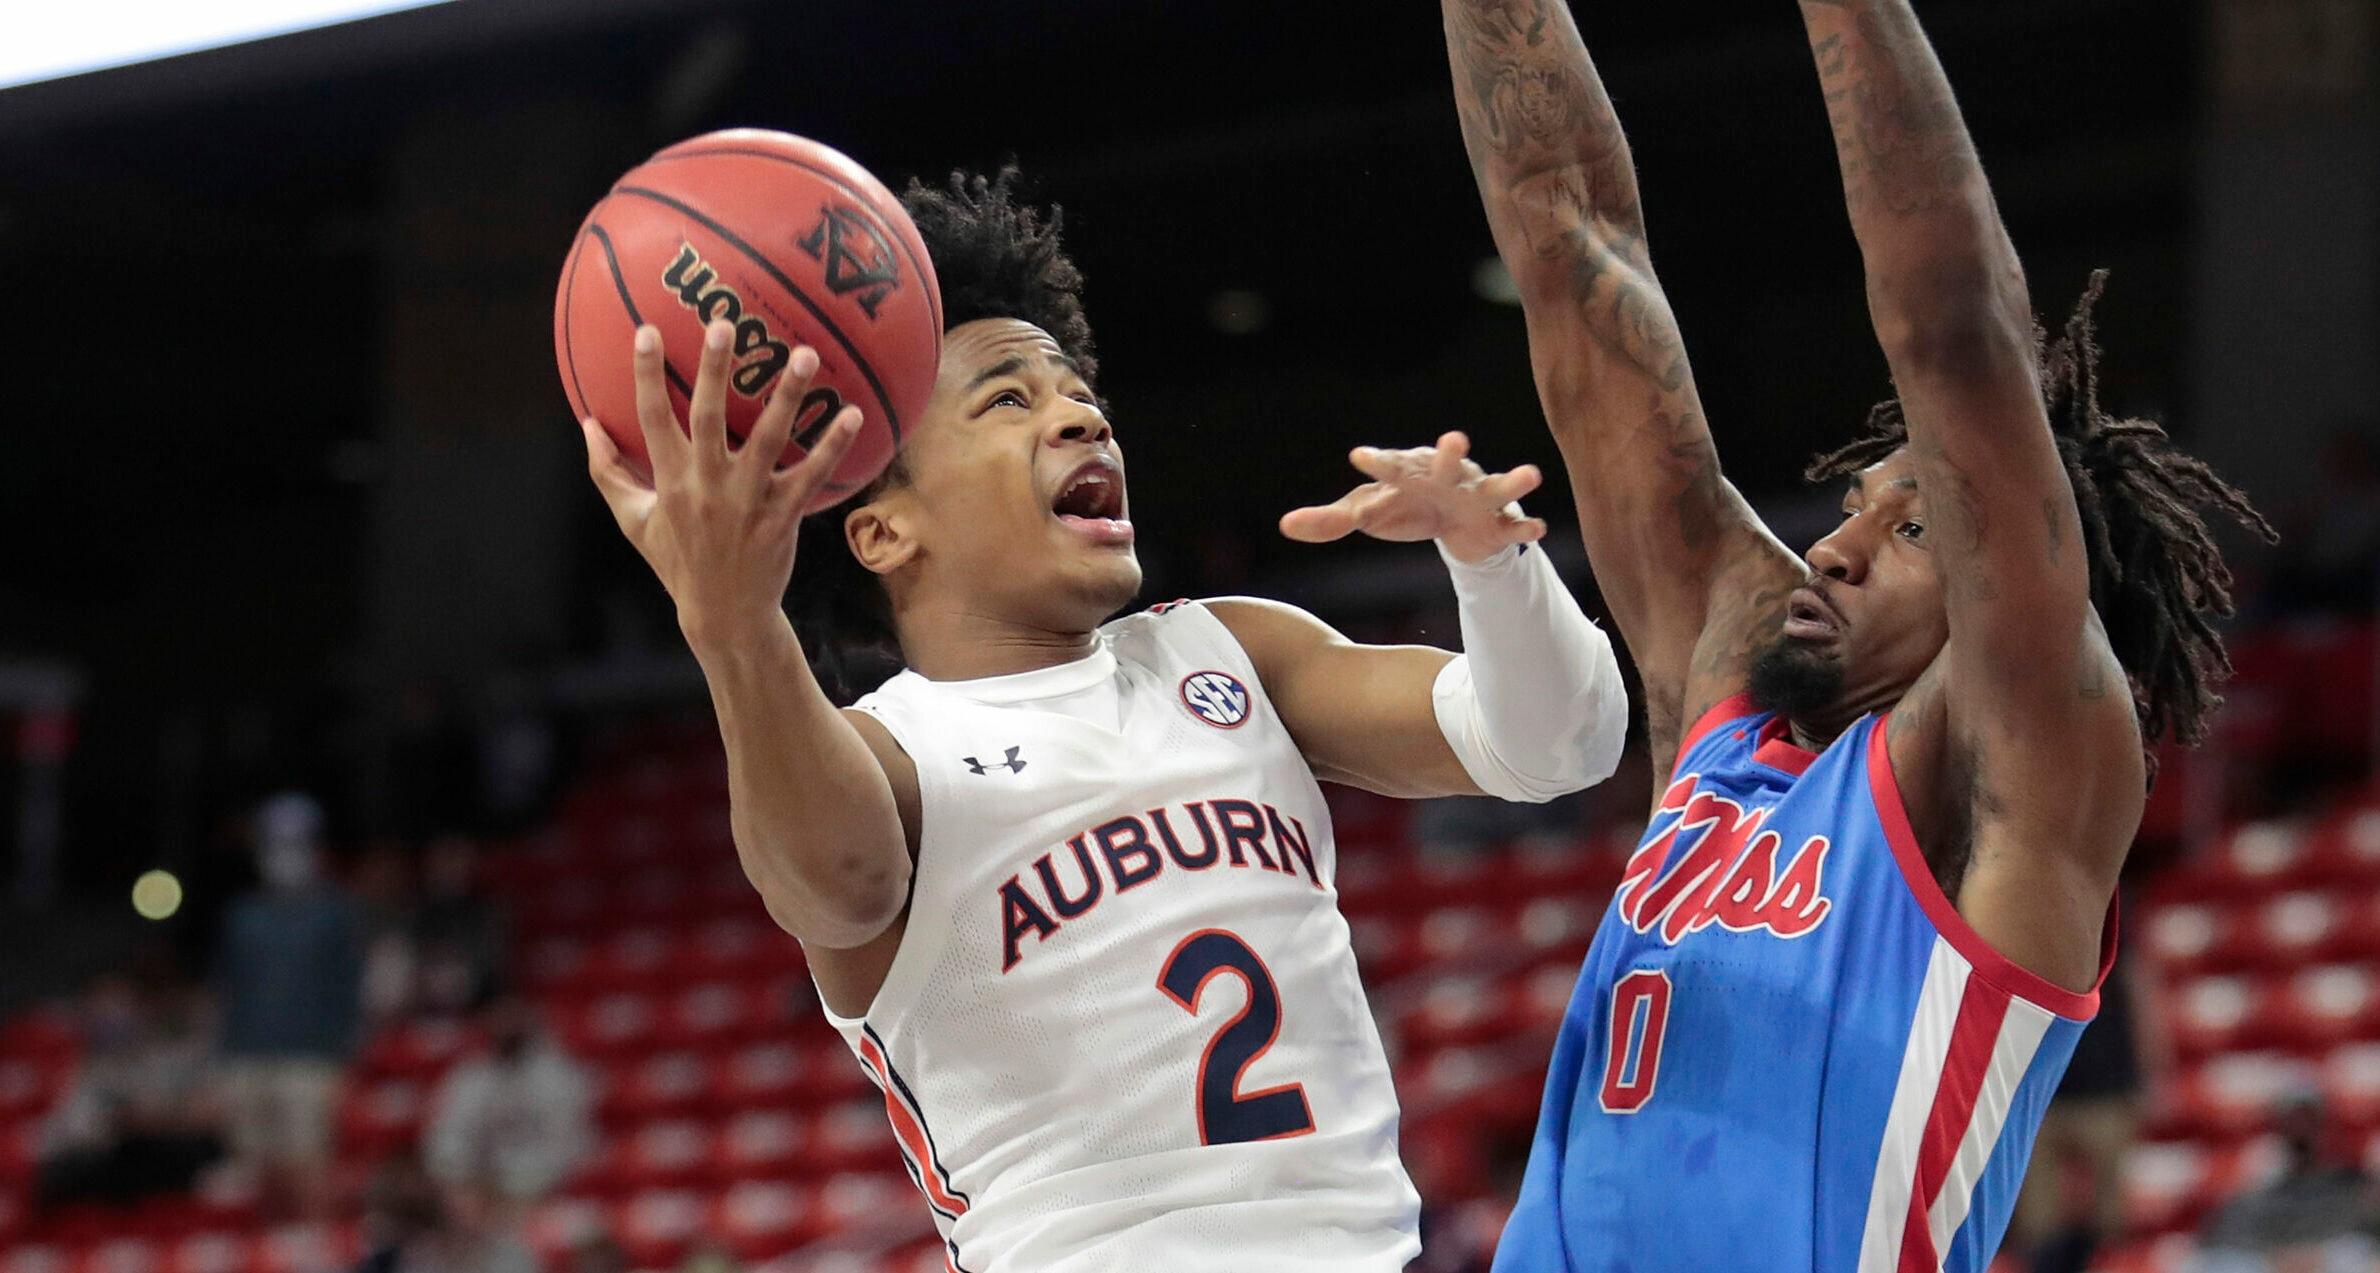 Auburn's Sharife Cooper to enter NBA draft, hire agent